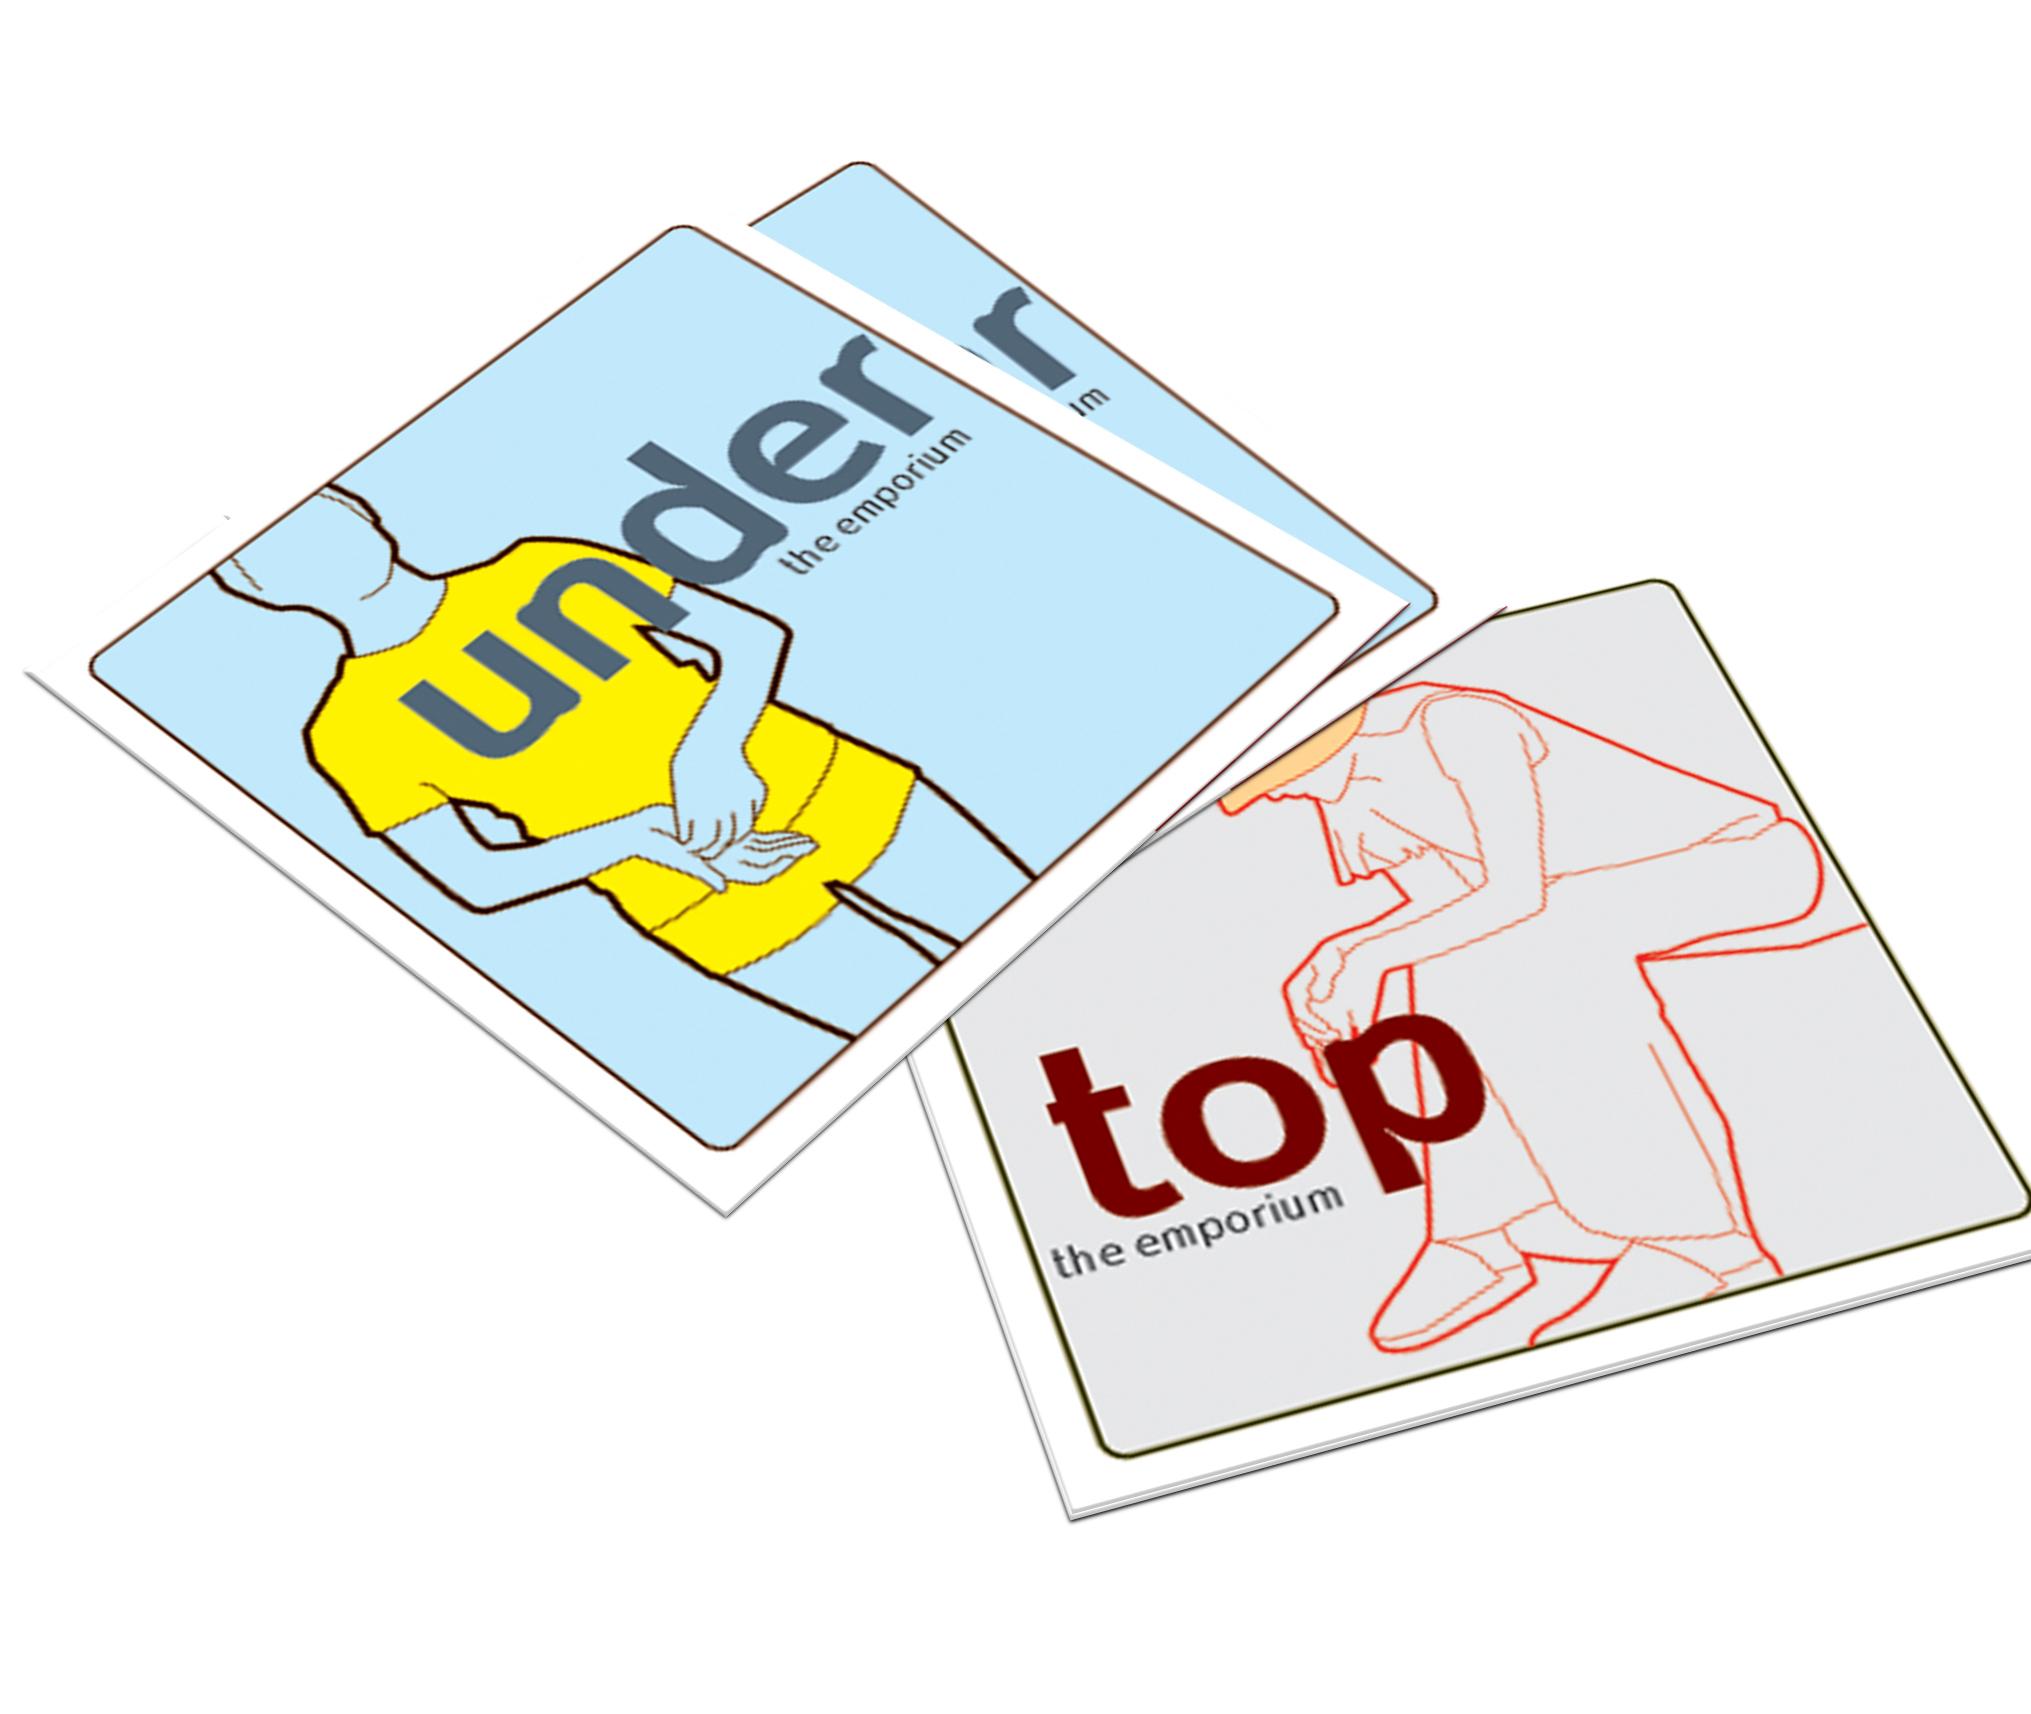 Emporium Business cards 1.jpg